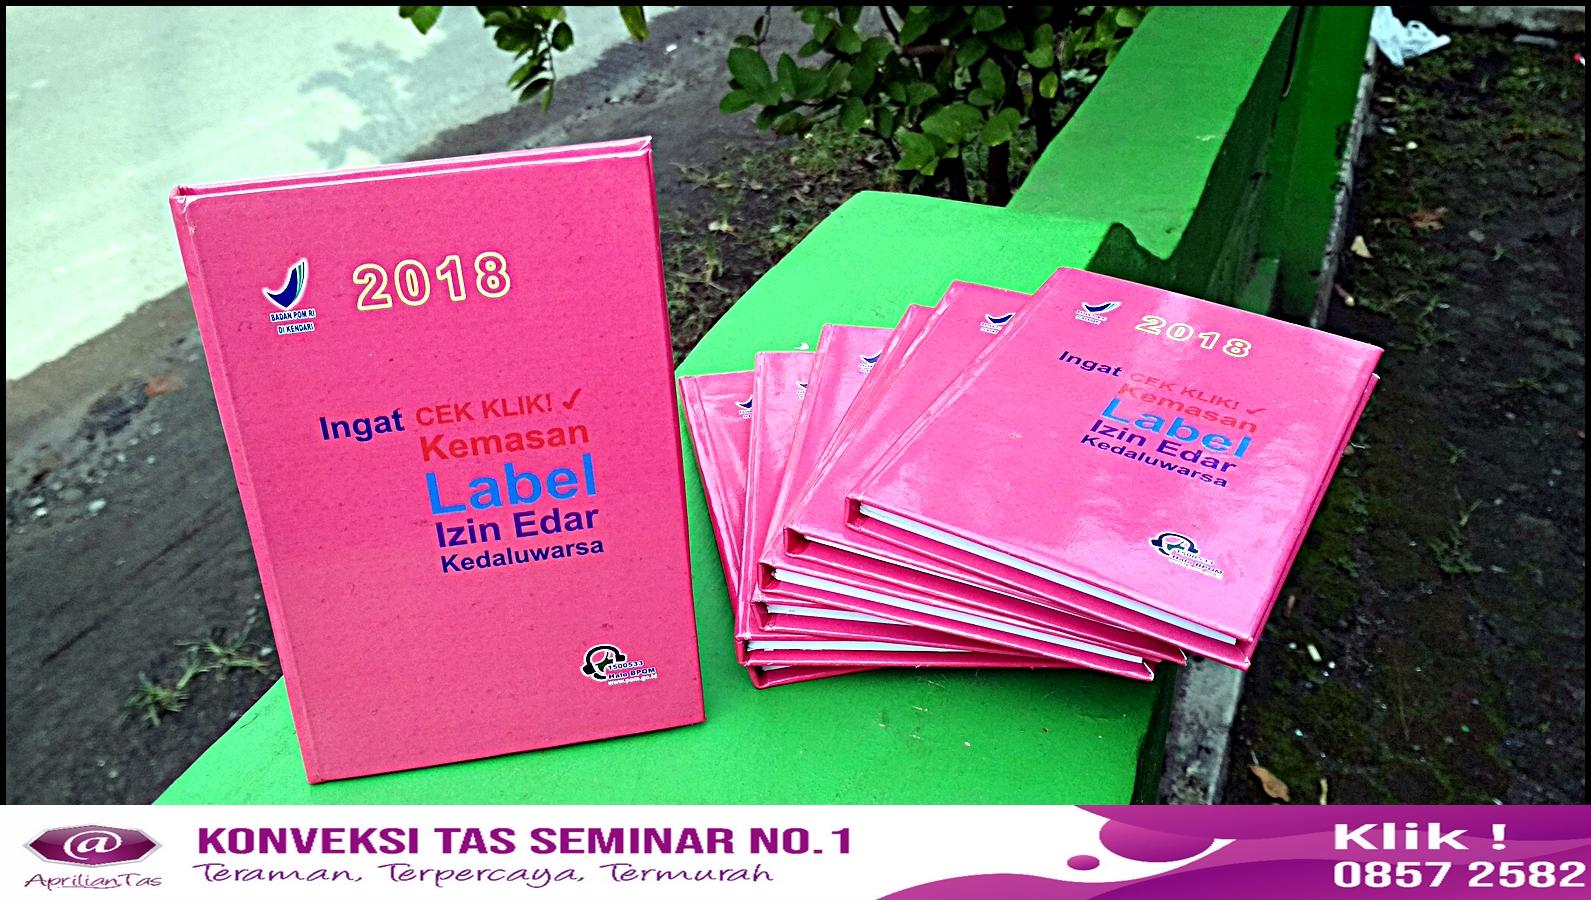 Isi Paket Seminar Kit Elegan, Pesan di Produsen Tas Souvenir Bandung  Tas ransel seminar kit,pabrik tas seminar ransel,harga tas ransel seminar kit,